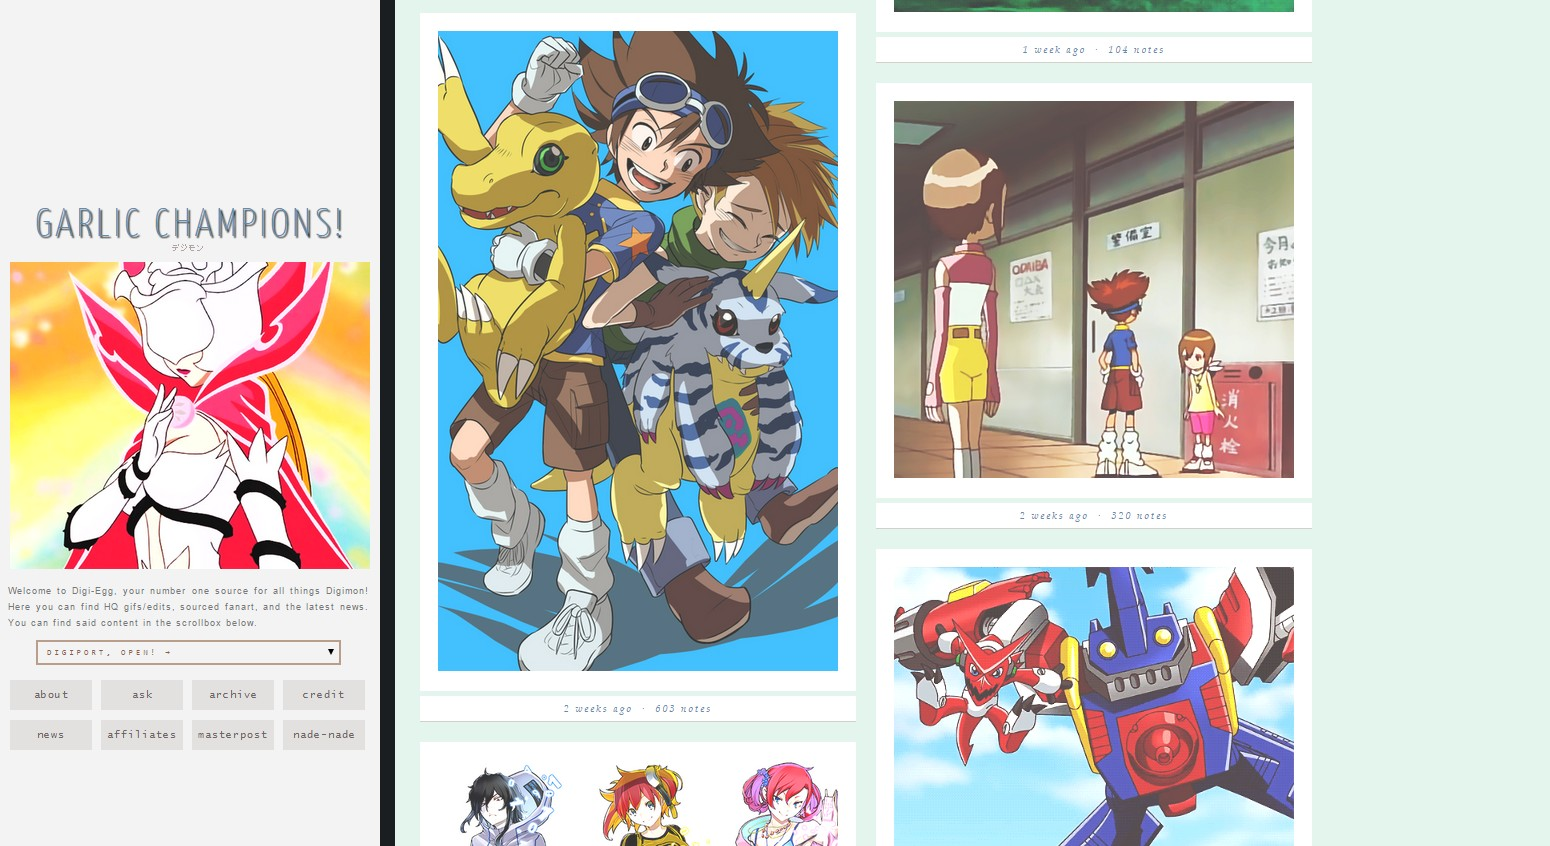 Digimon otaku